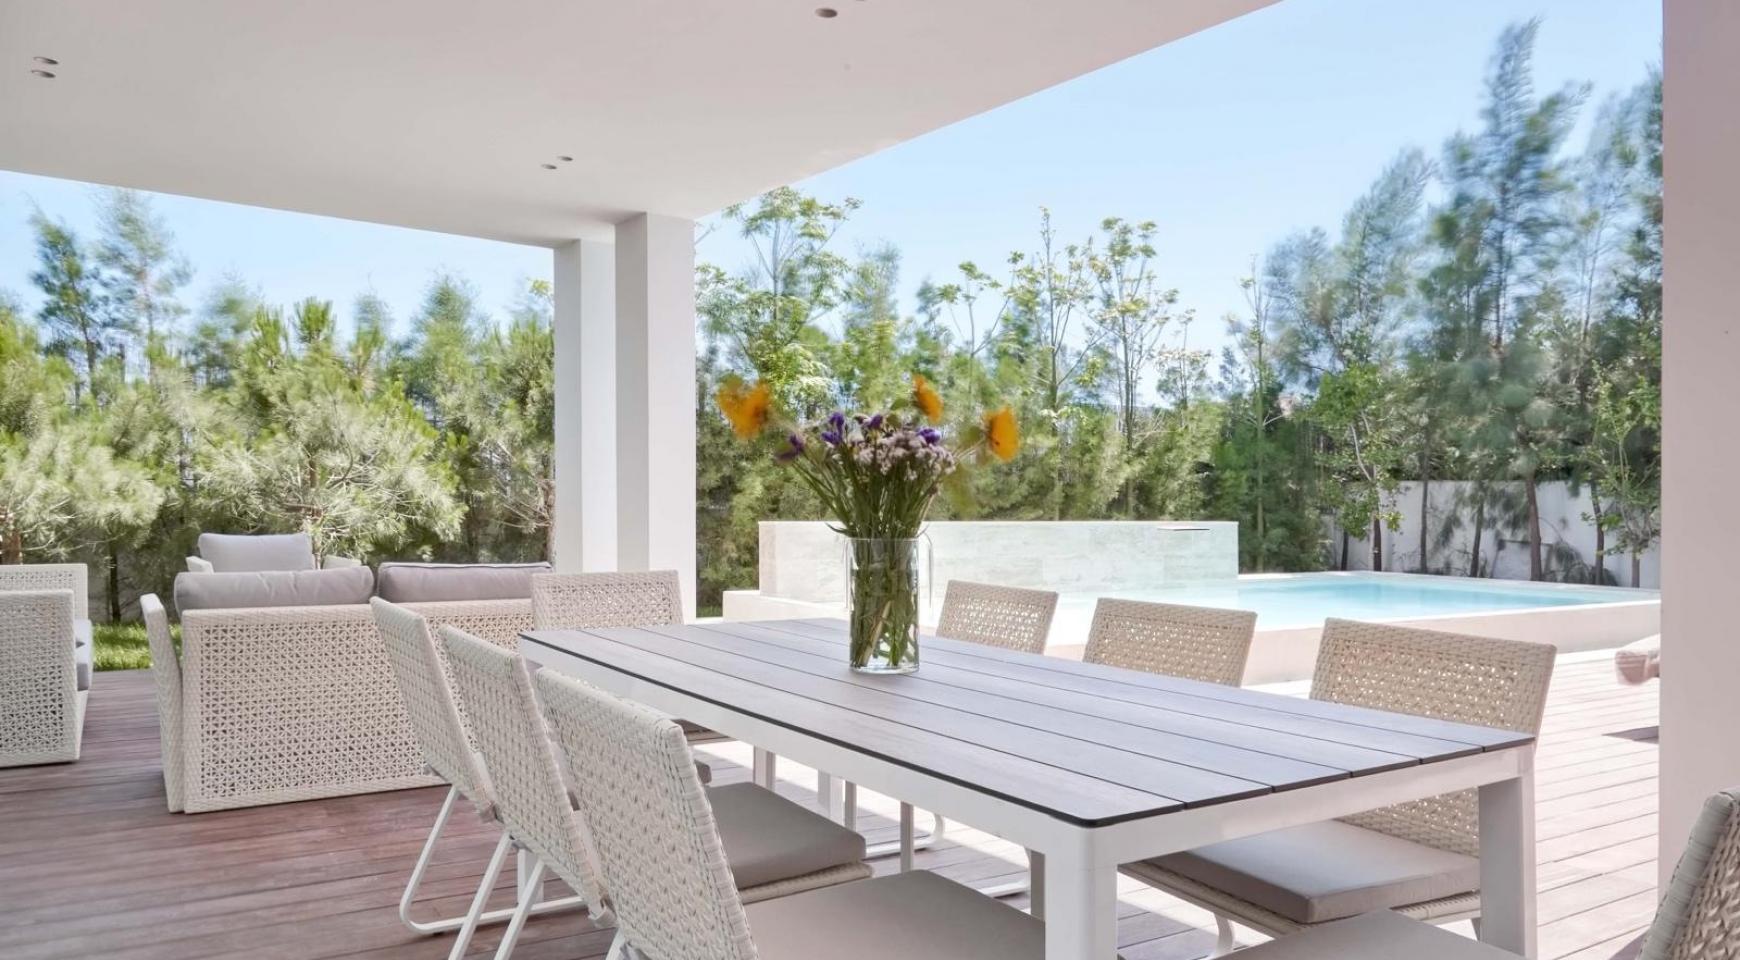 New Luxurious 4 Bedroom Villa in the Tourist Area - 8